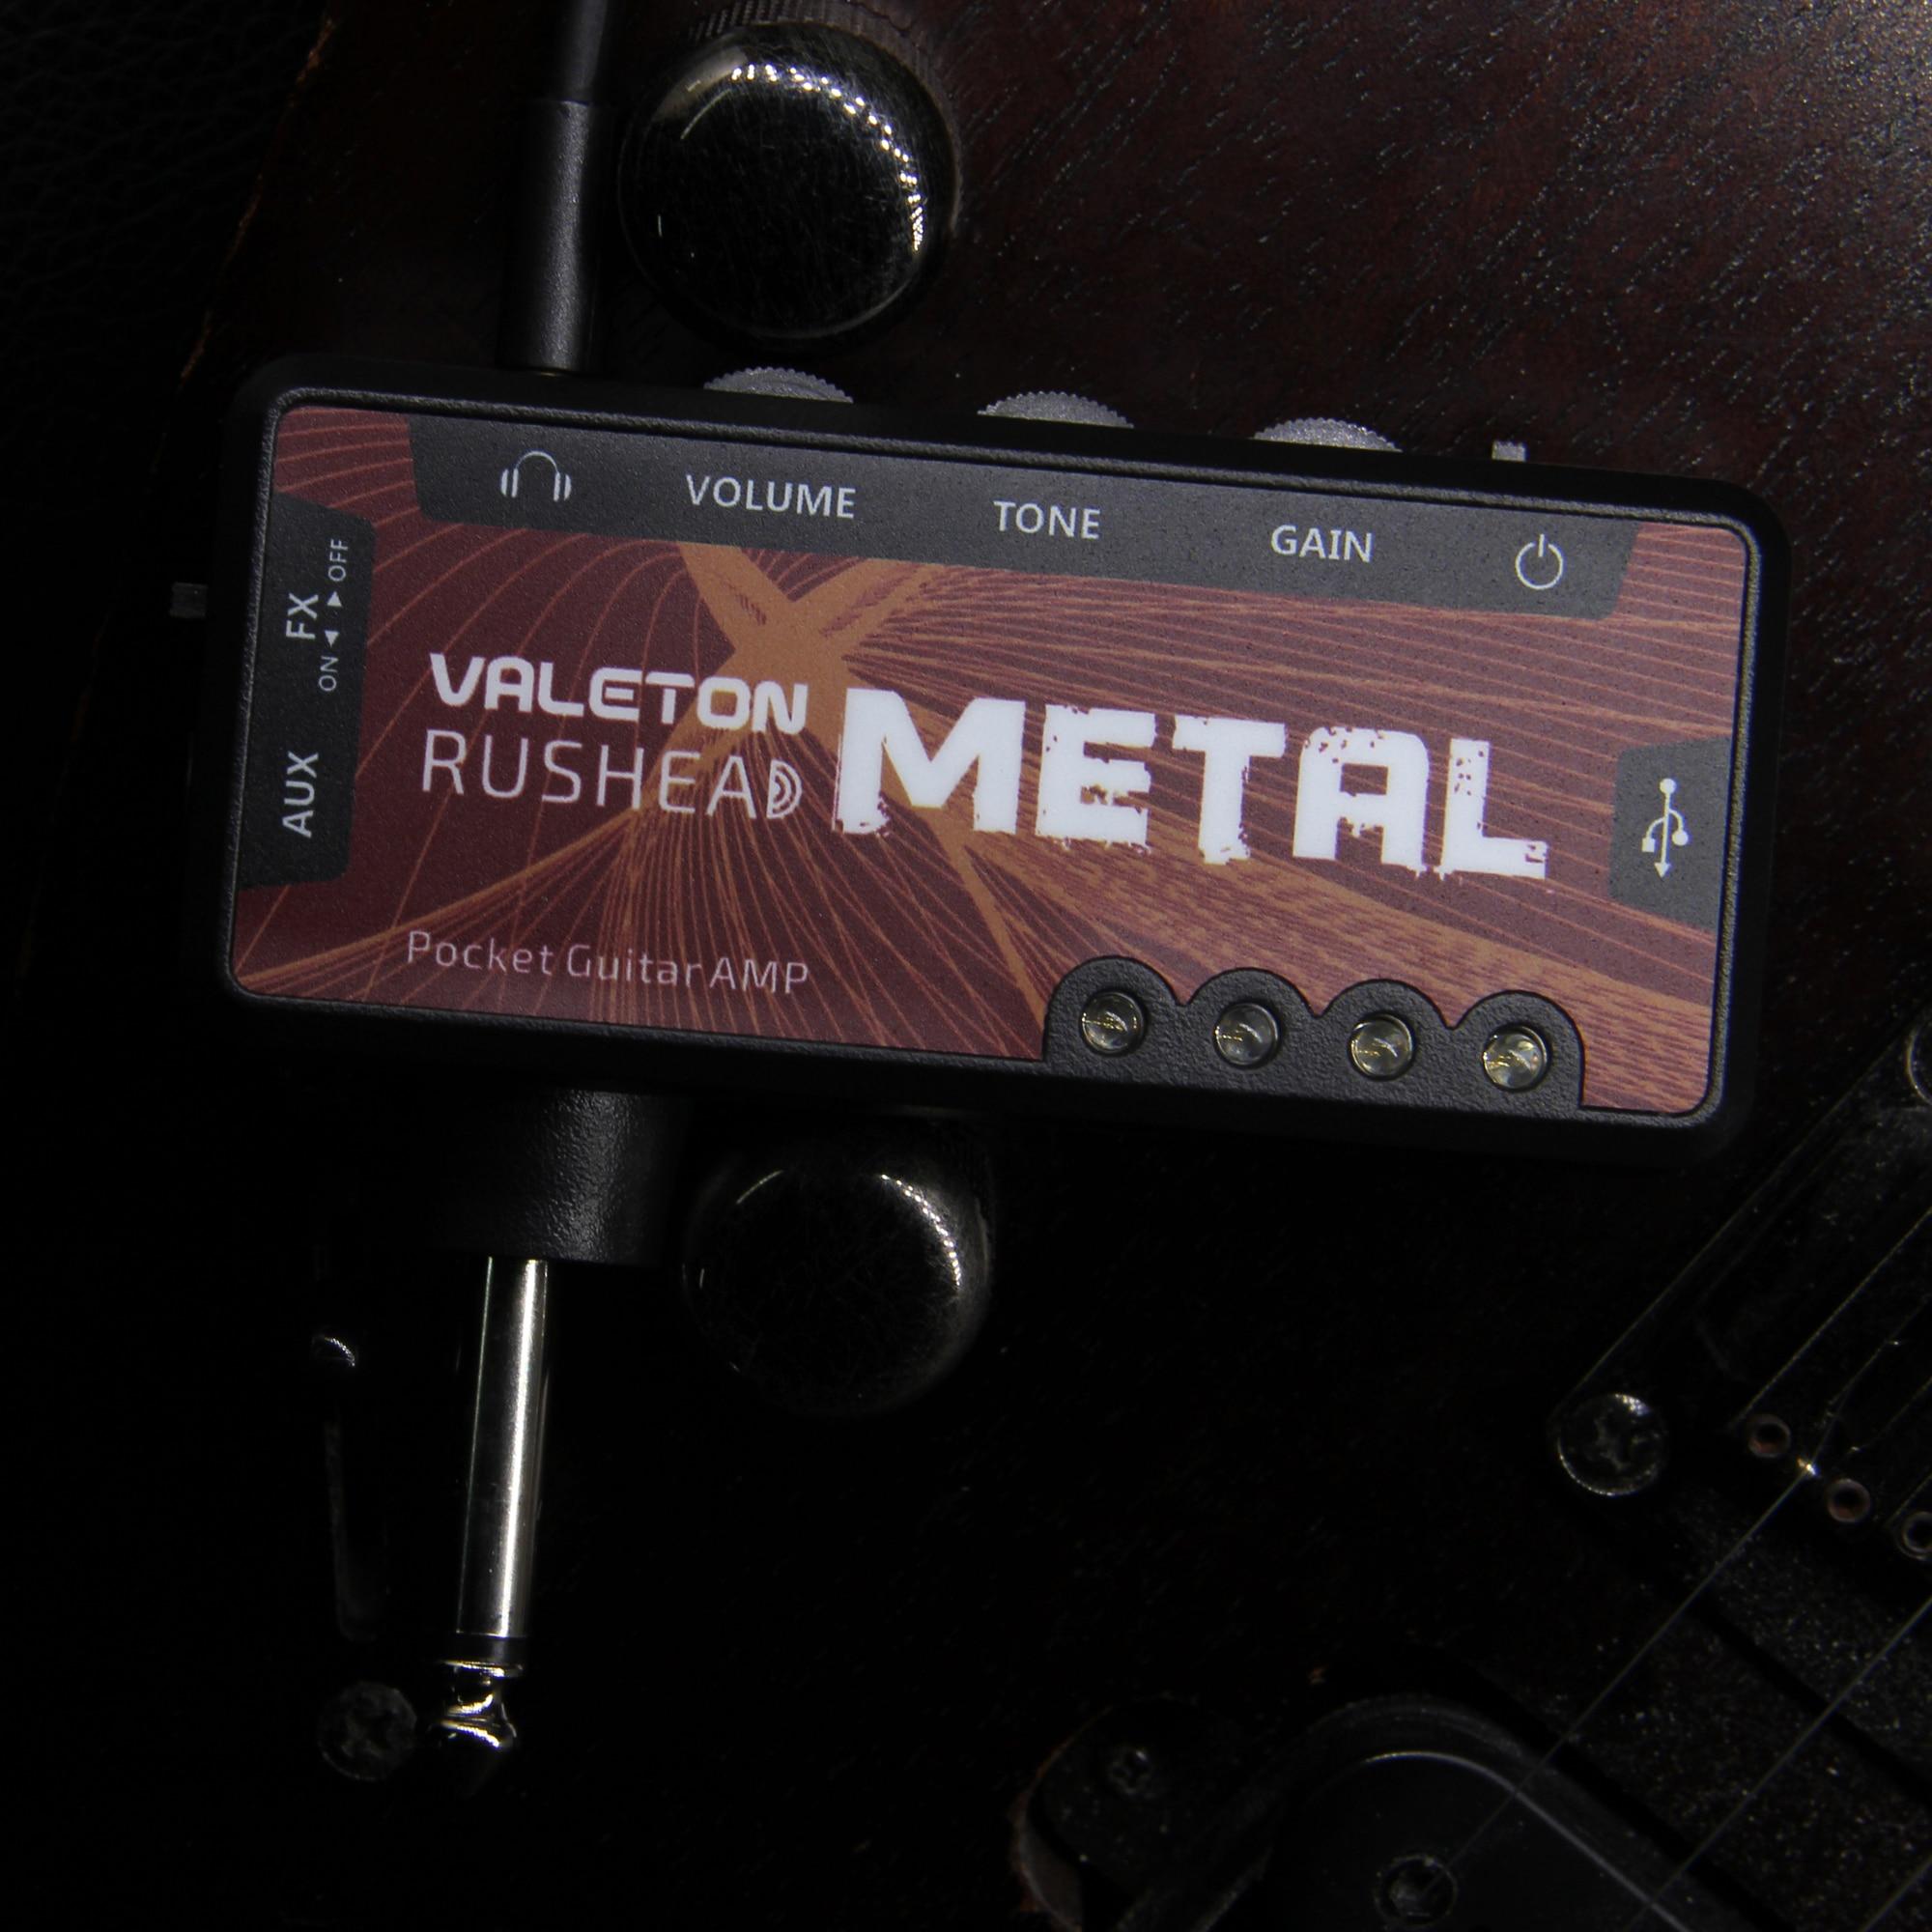 Valeton Pocket Guitar AMP RUSHEAD Metal Mini Amplifier USB Charge Headphone Splitter Electric Bass Guitar AUX RH-3 Metal цена 2017